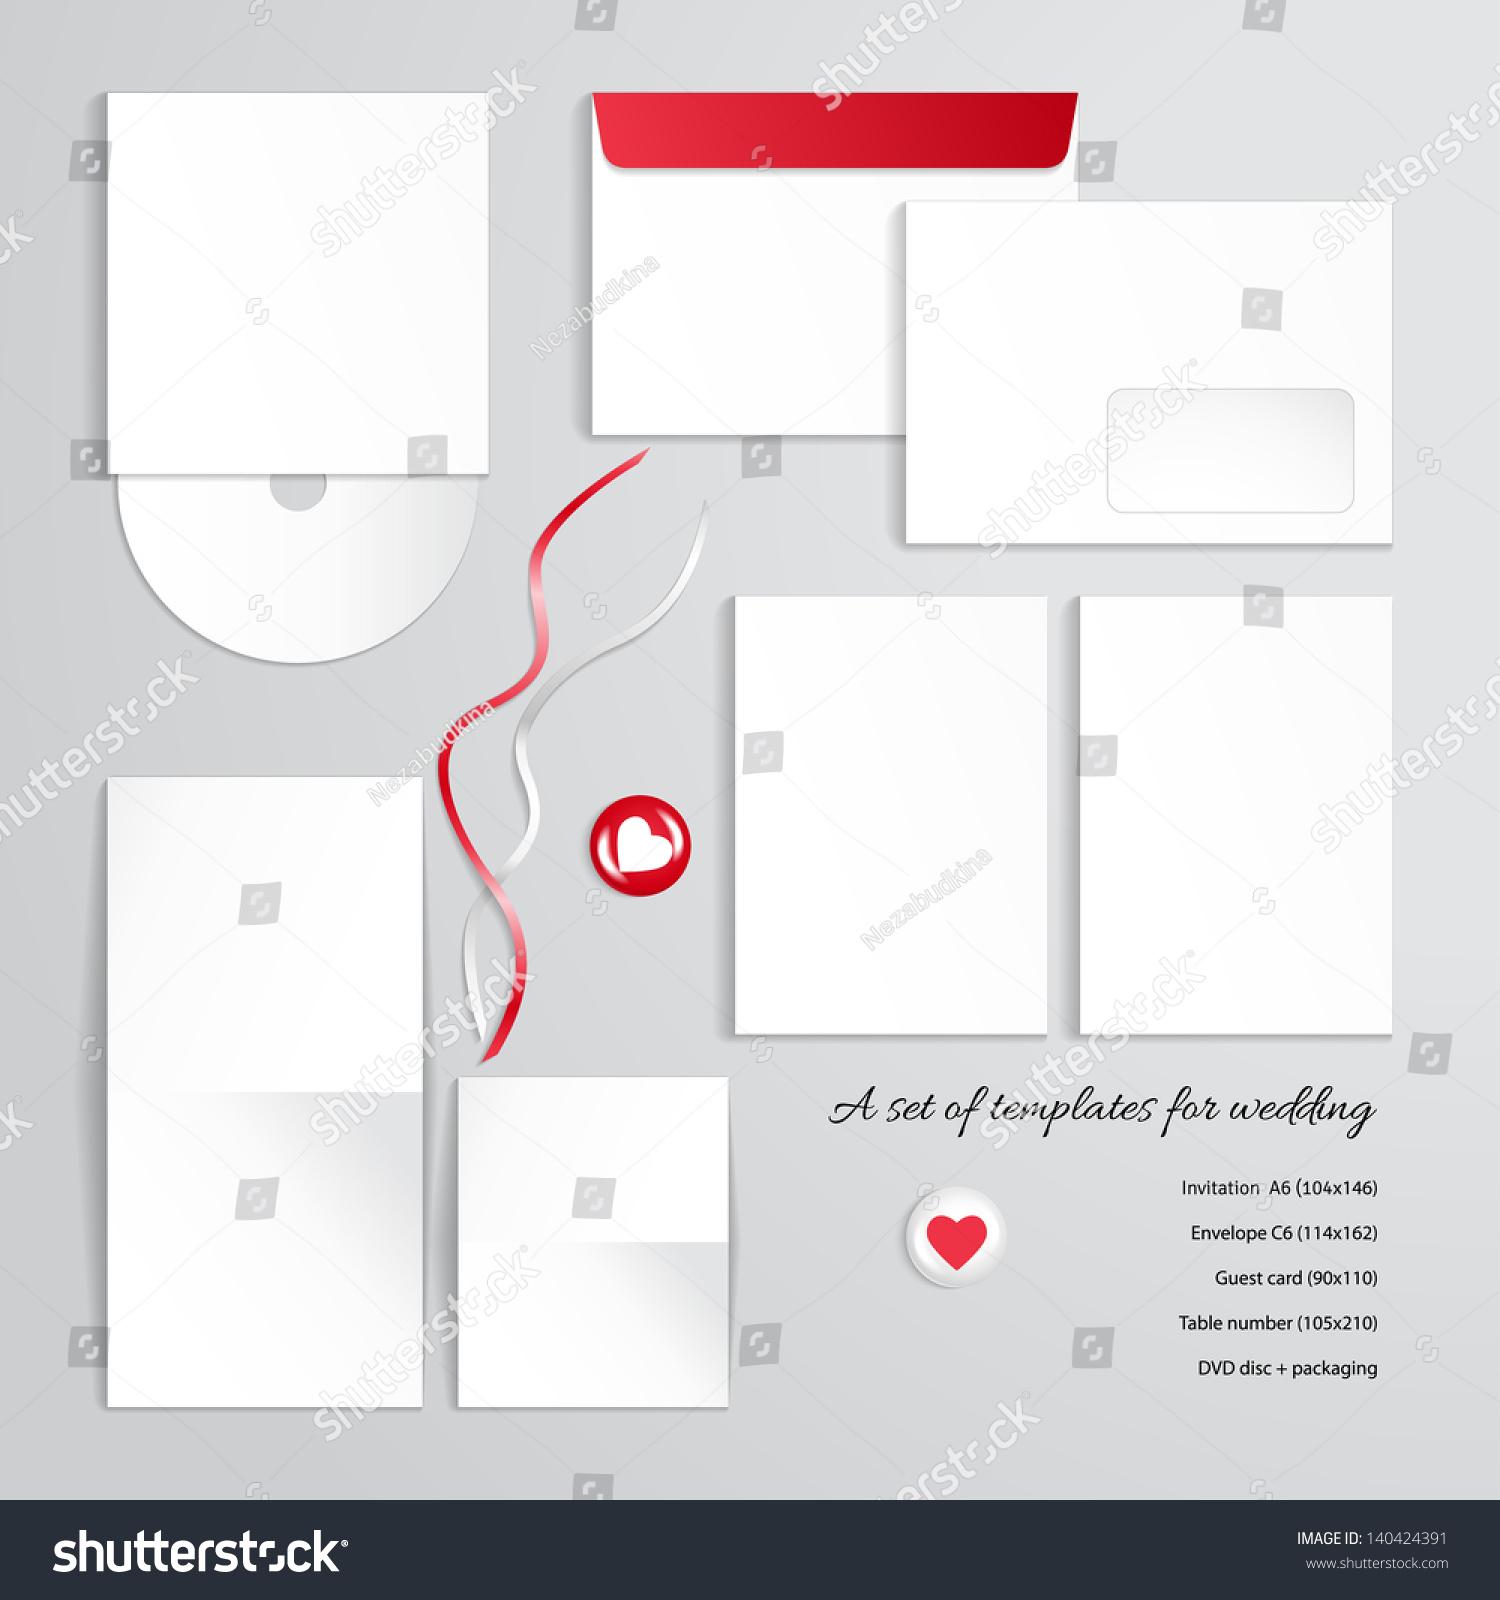 Vector Templates Design Wedding Invitation Envelope Stock Vector